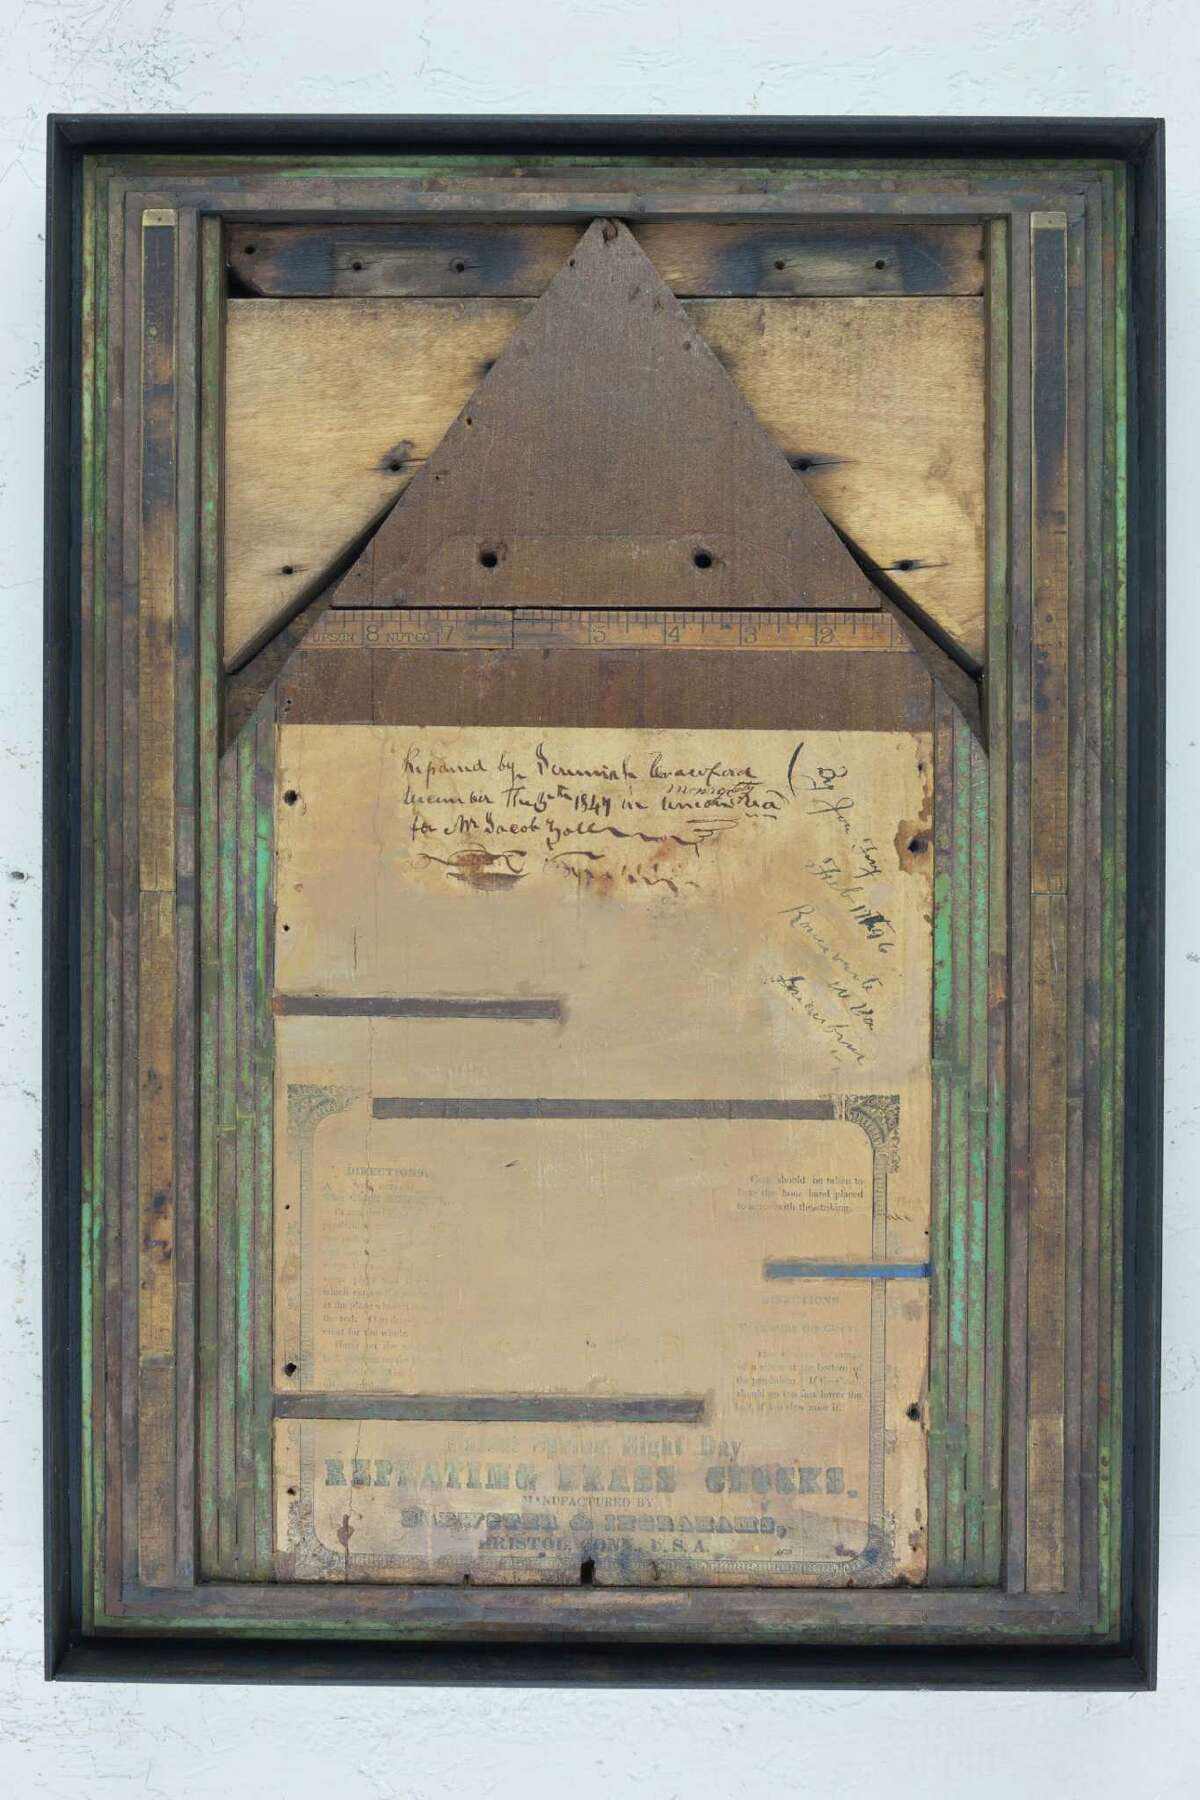 The Hands of Time: A Retrospective of artist Randall Reid runs through Nov. 6 at the KCAM,